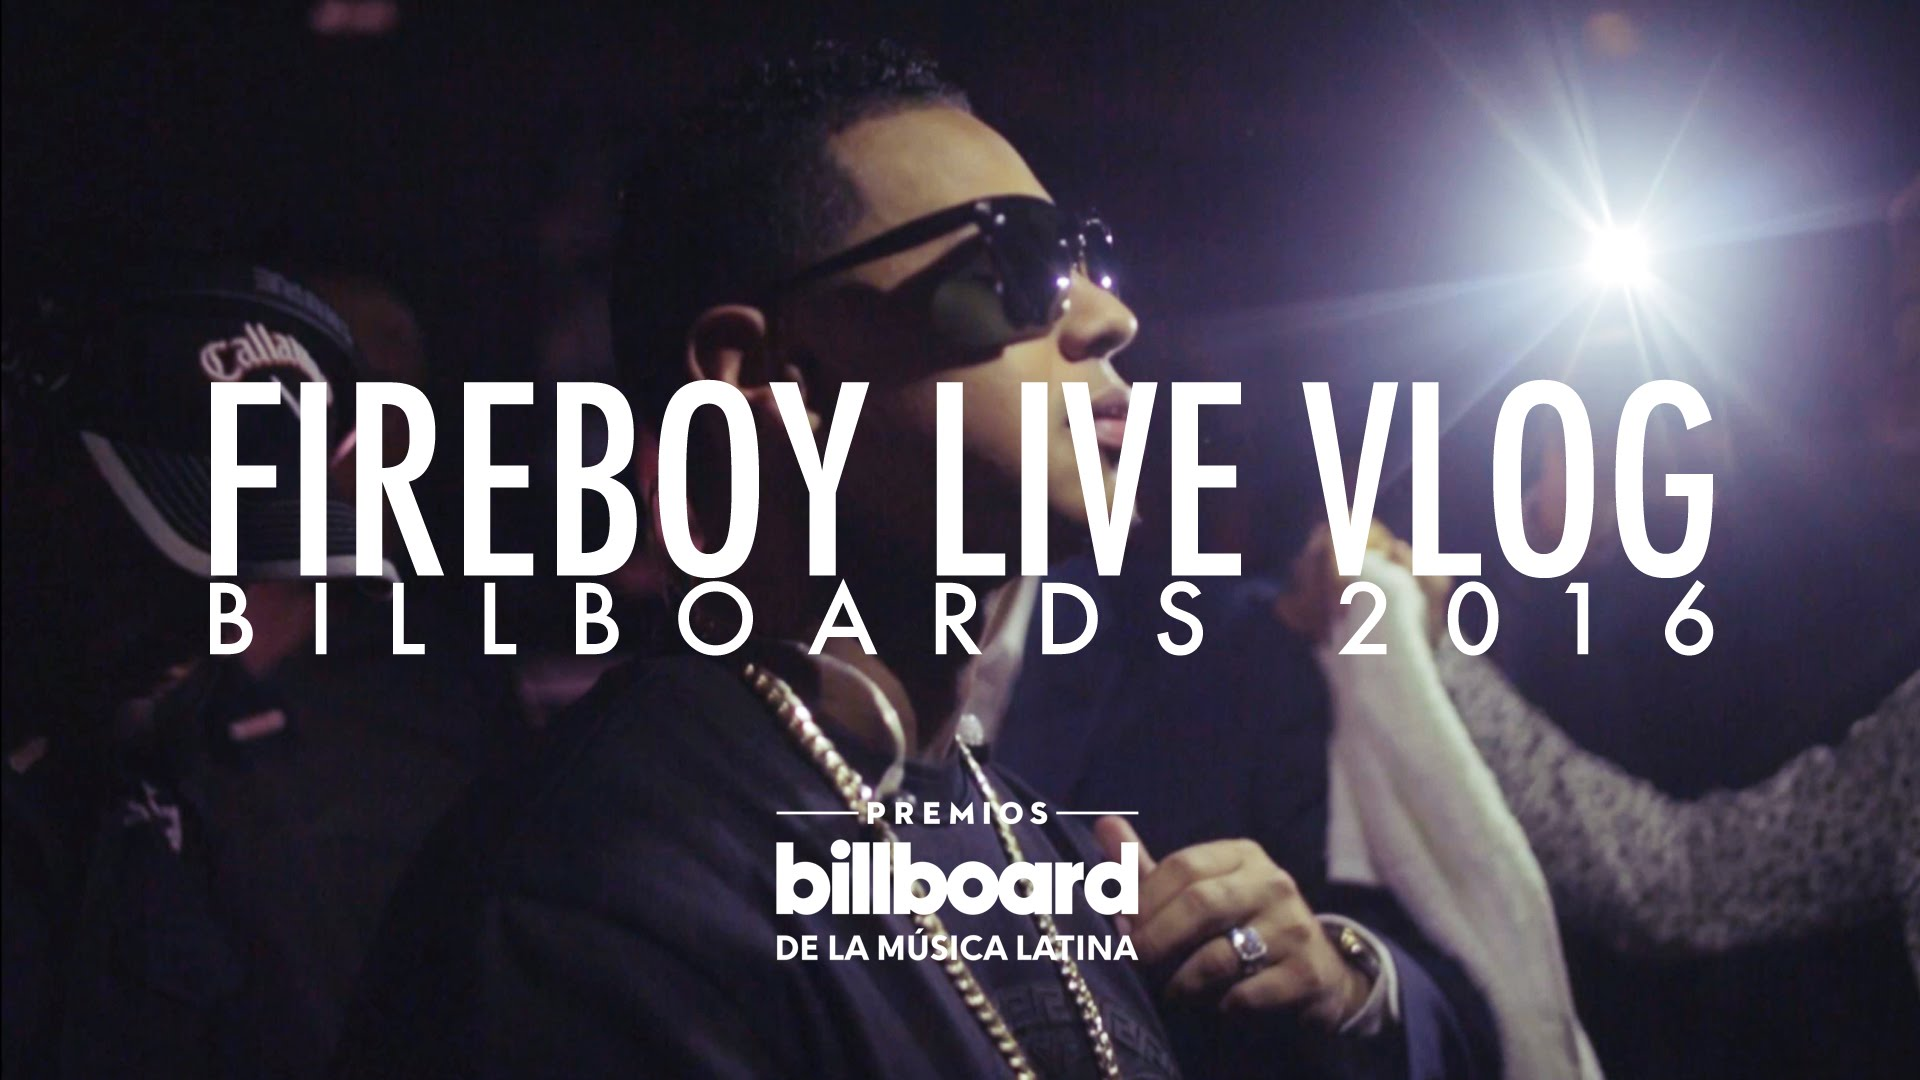 fuego fireboy live vlog billboar - Fuego – Fireboy Live Vlog (Billboards 2016)